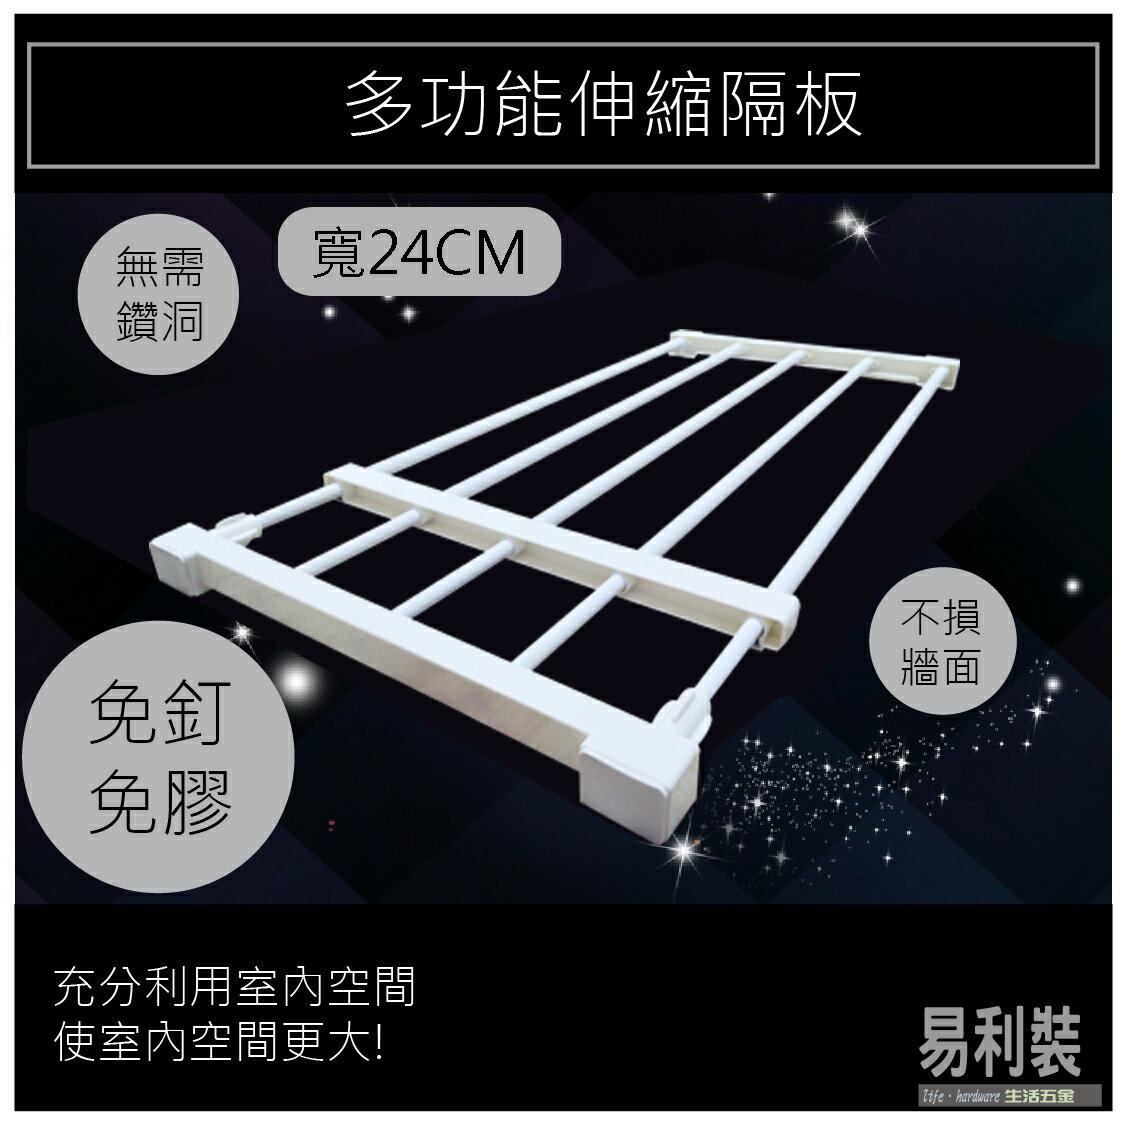 【 EASYCAN 】EC001 多功能伸縮隔板 易利裝生活五金 衣櫃 小資族 置物架 收納架 層板架